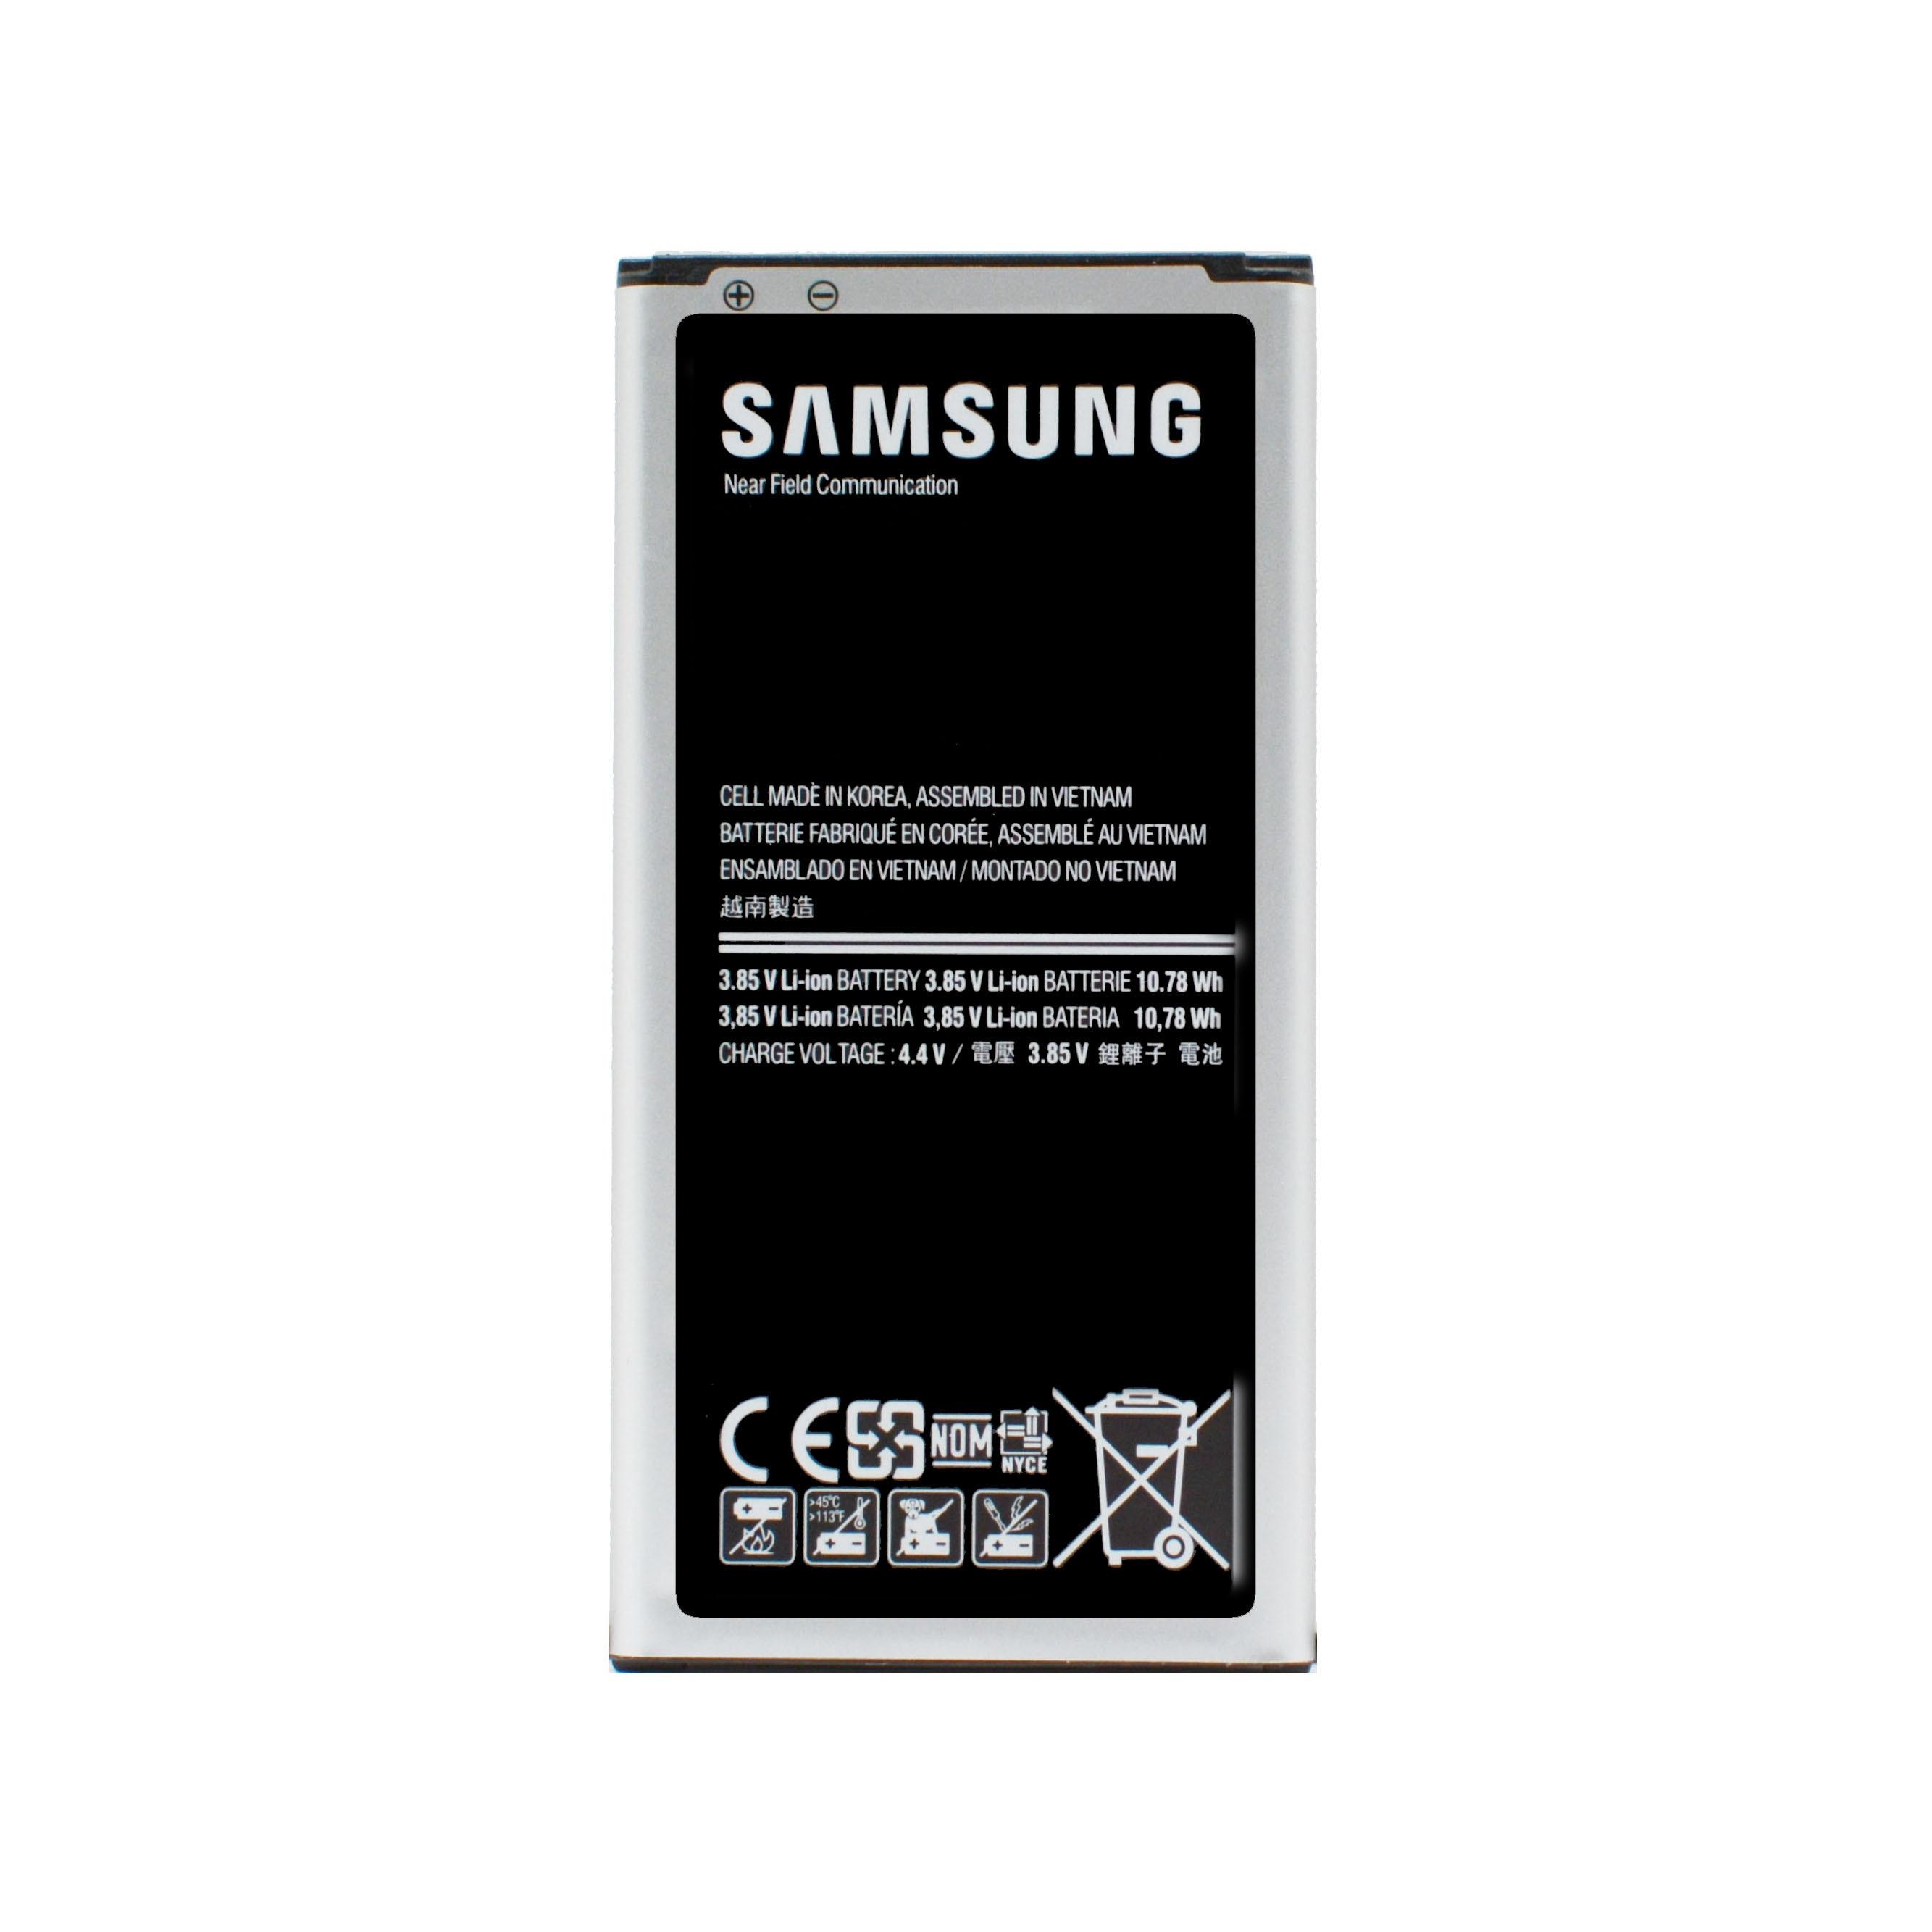 20pcs/lot Battery EB-BG900BBE for Samsung Galaxy s5 G900 G900S G900I G900F G900H Original NFC Replacement Phone Bateria 2800mAh enlarge